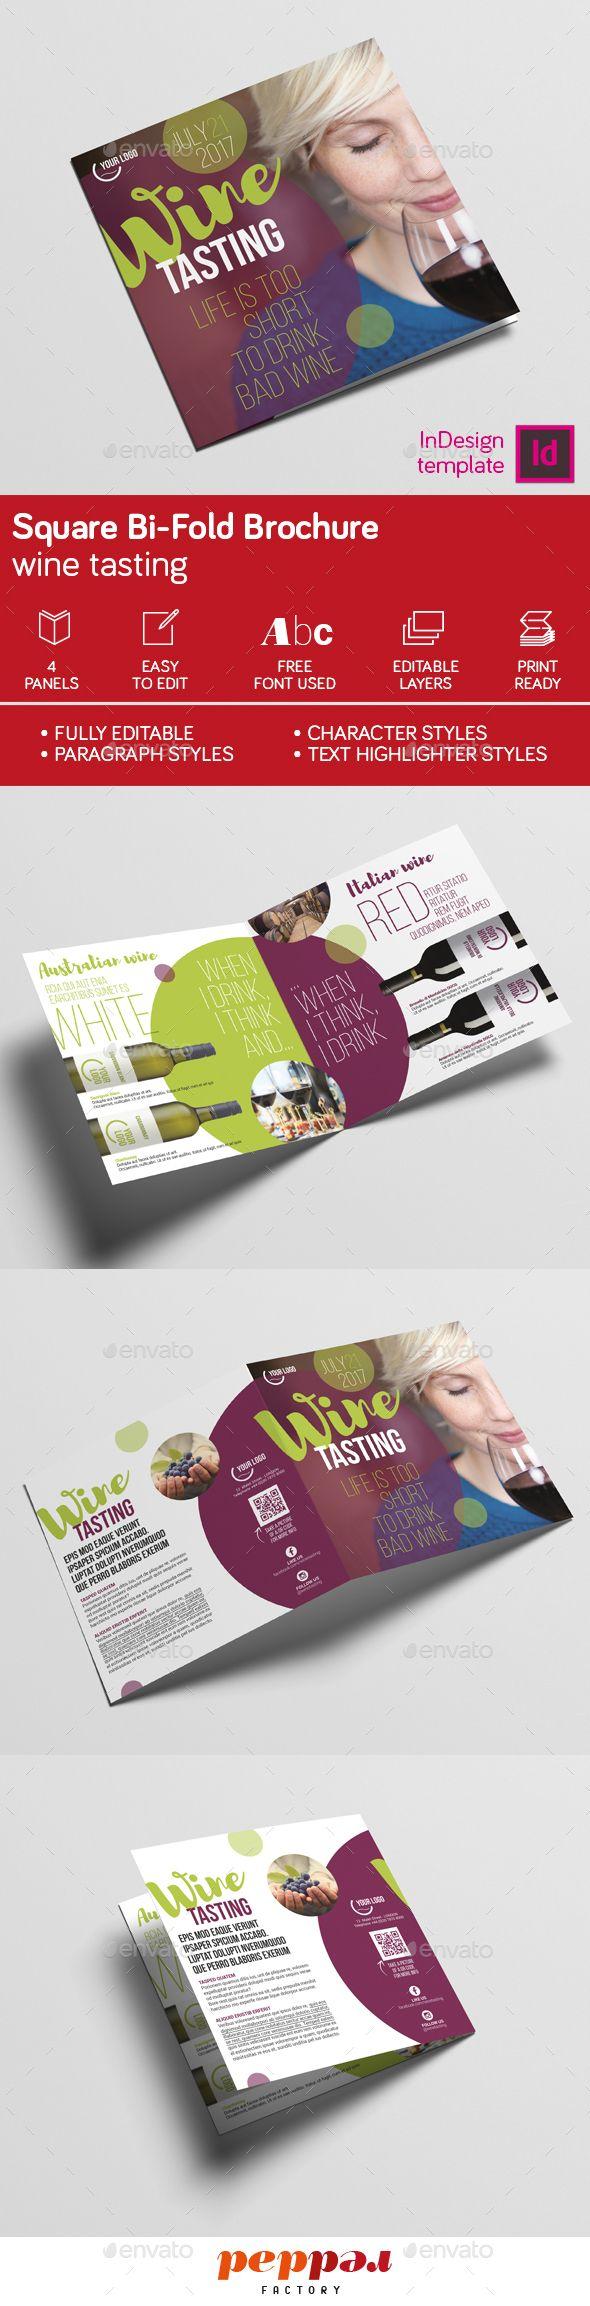 Wine Square Bi Fold Brochure Template Indesign Indd Download Here  Httpgraphicrivernetitemwine Square Bifold Brochure16098044Refksioks